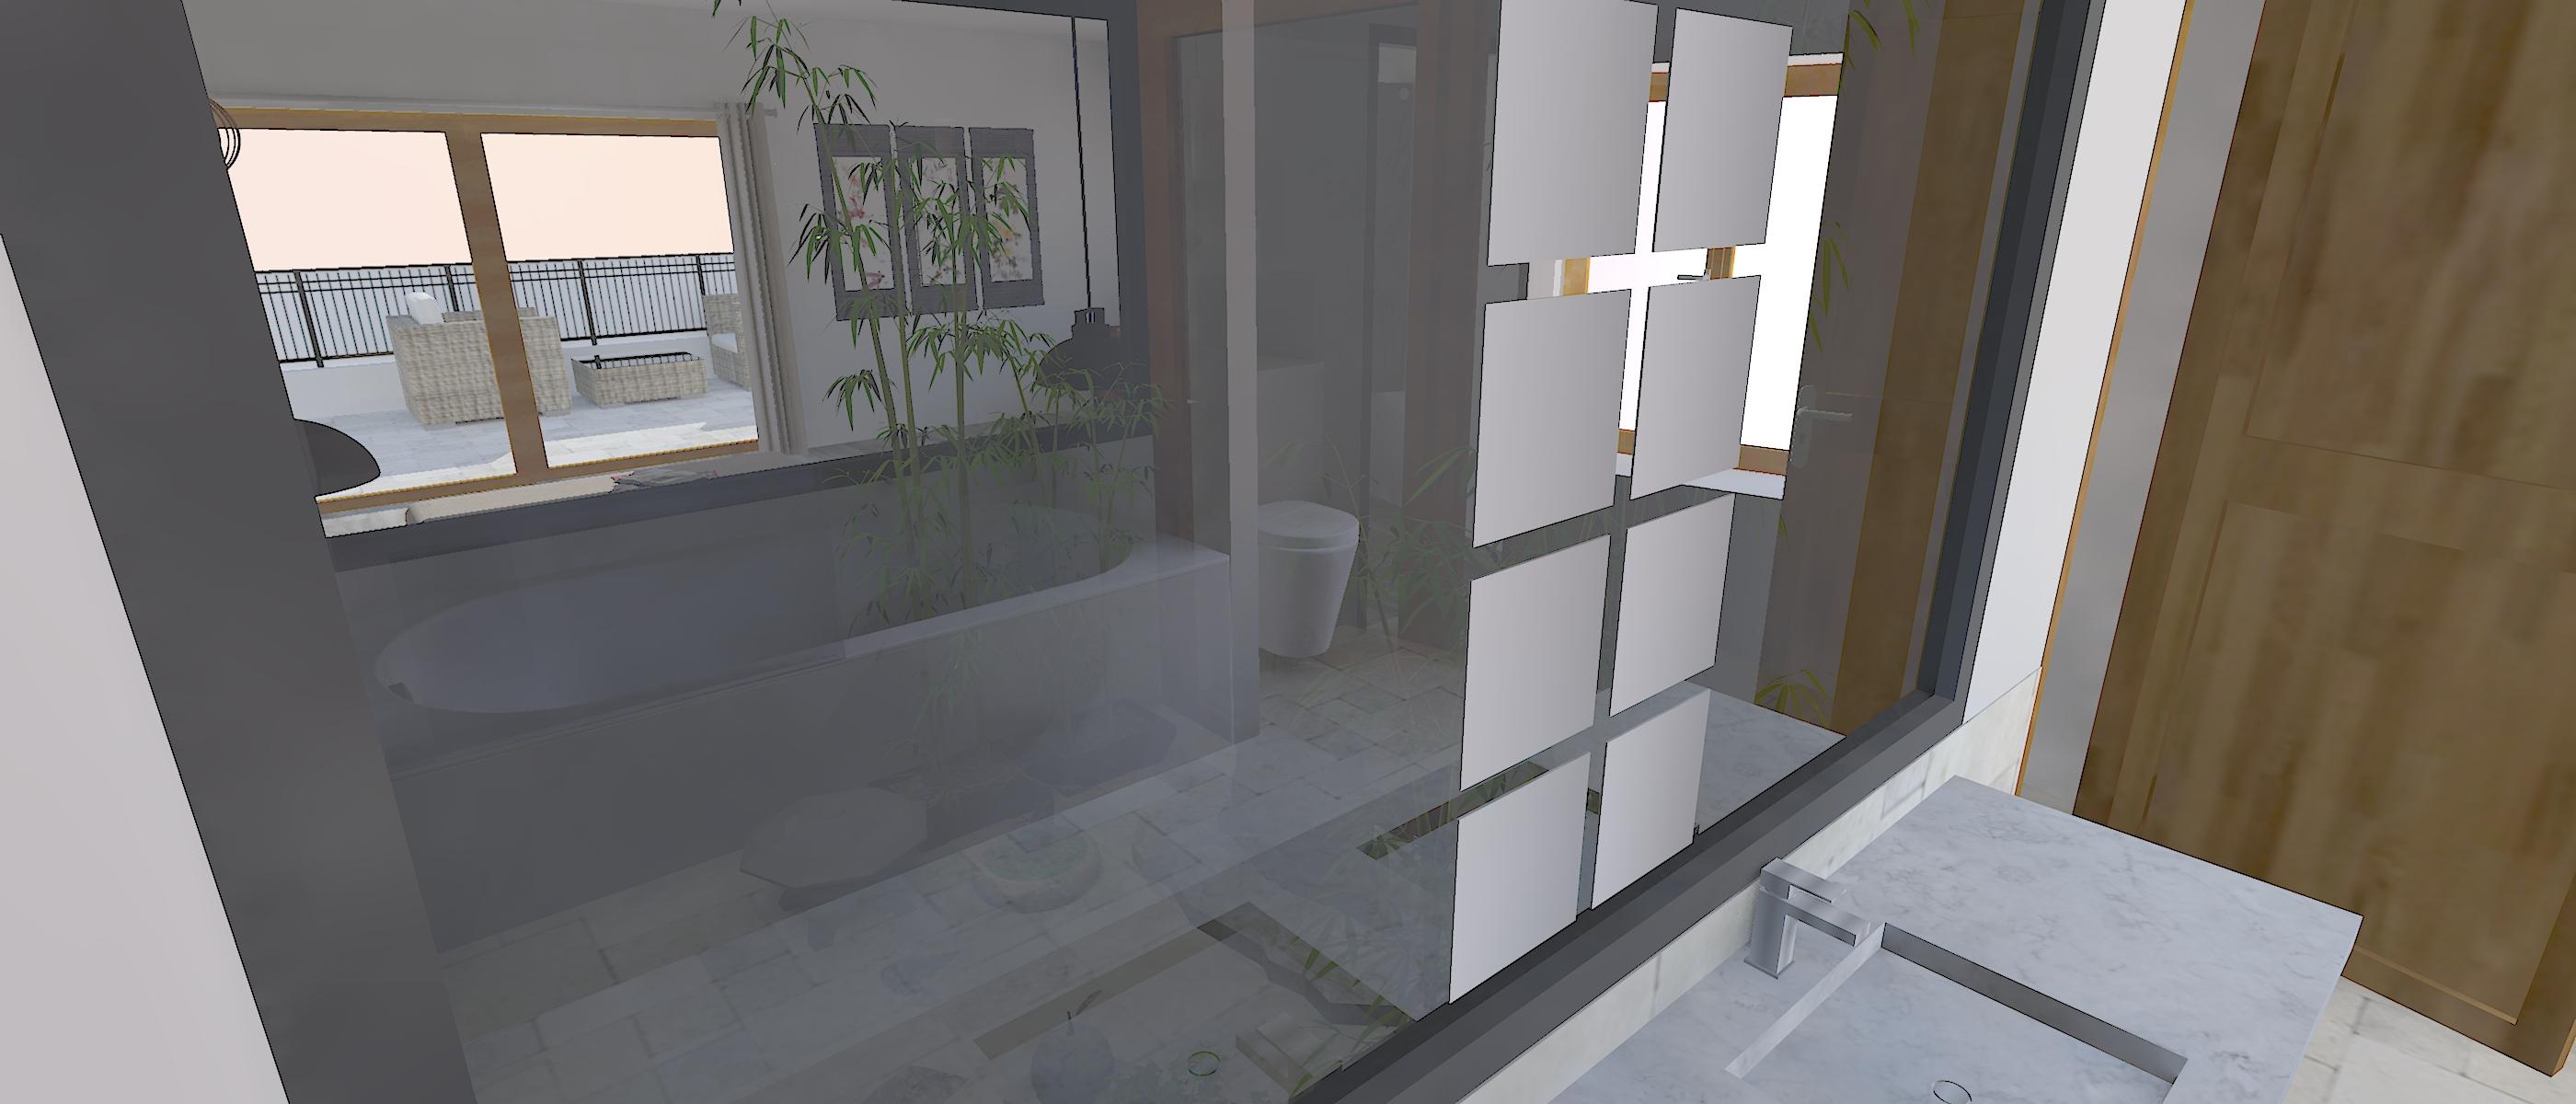 Salle de bain sur patio